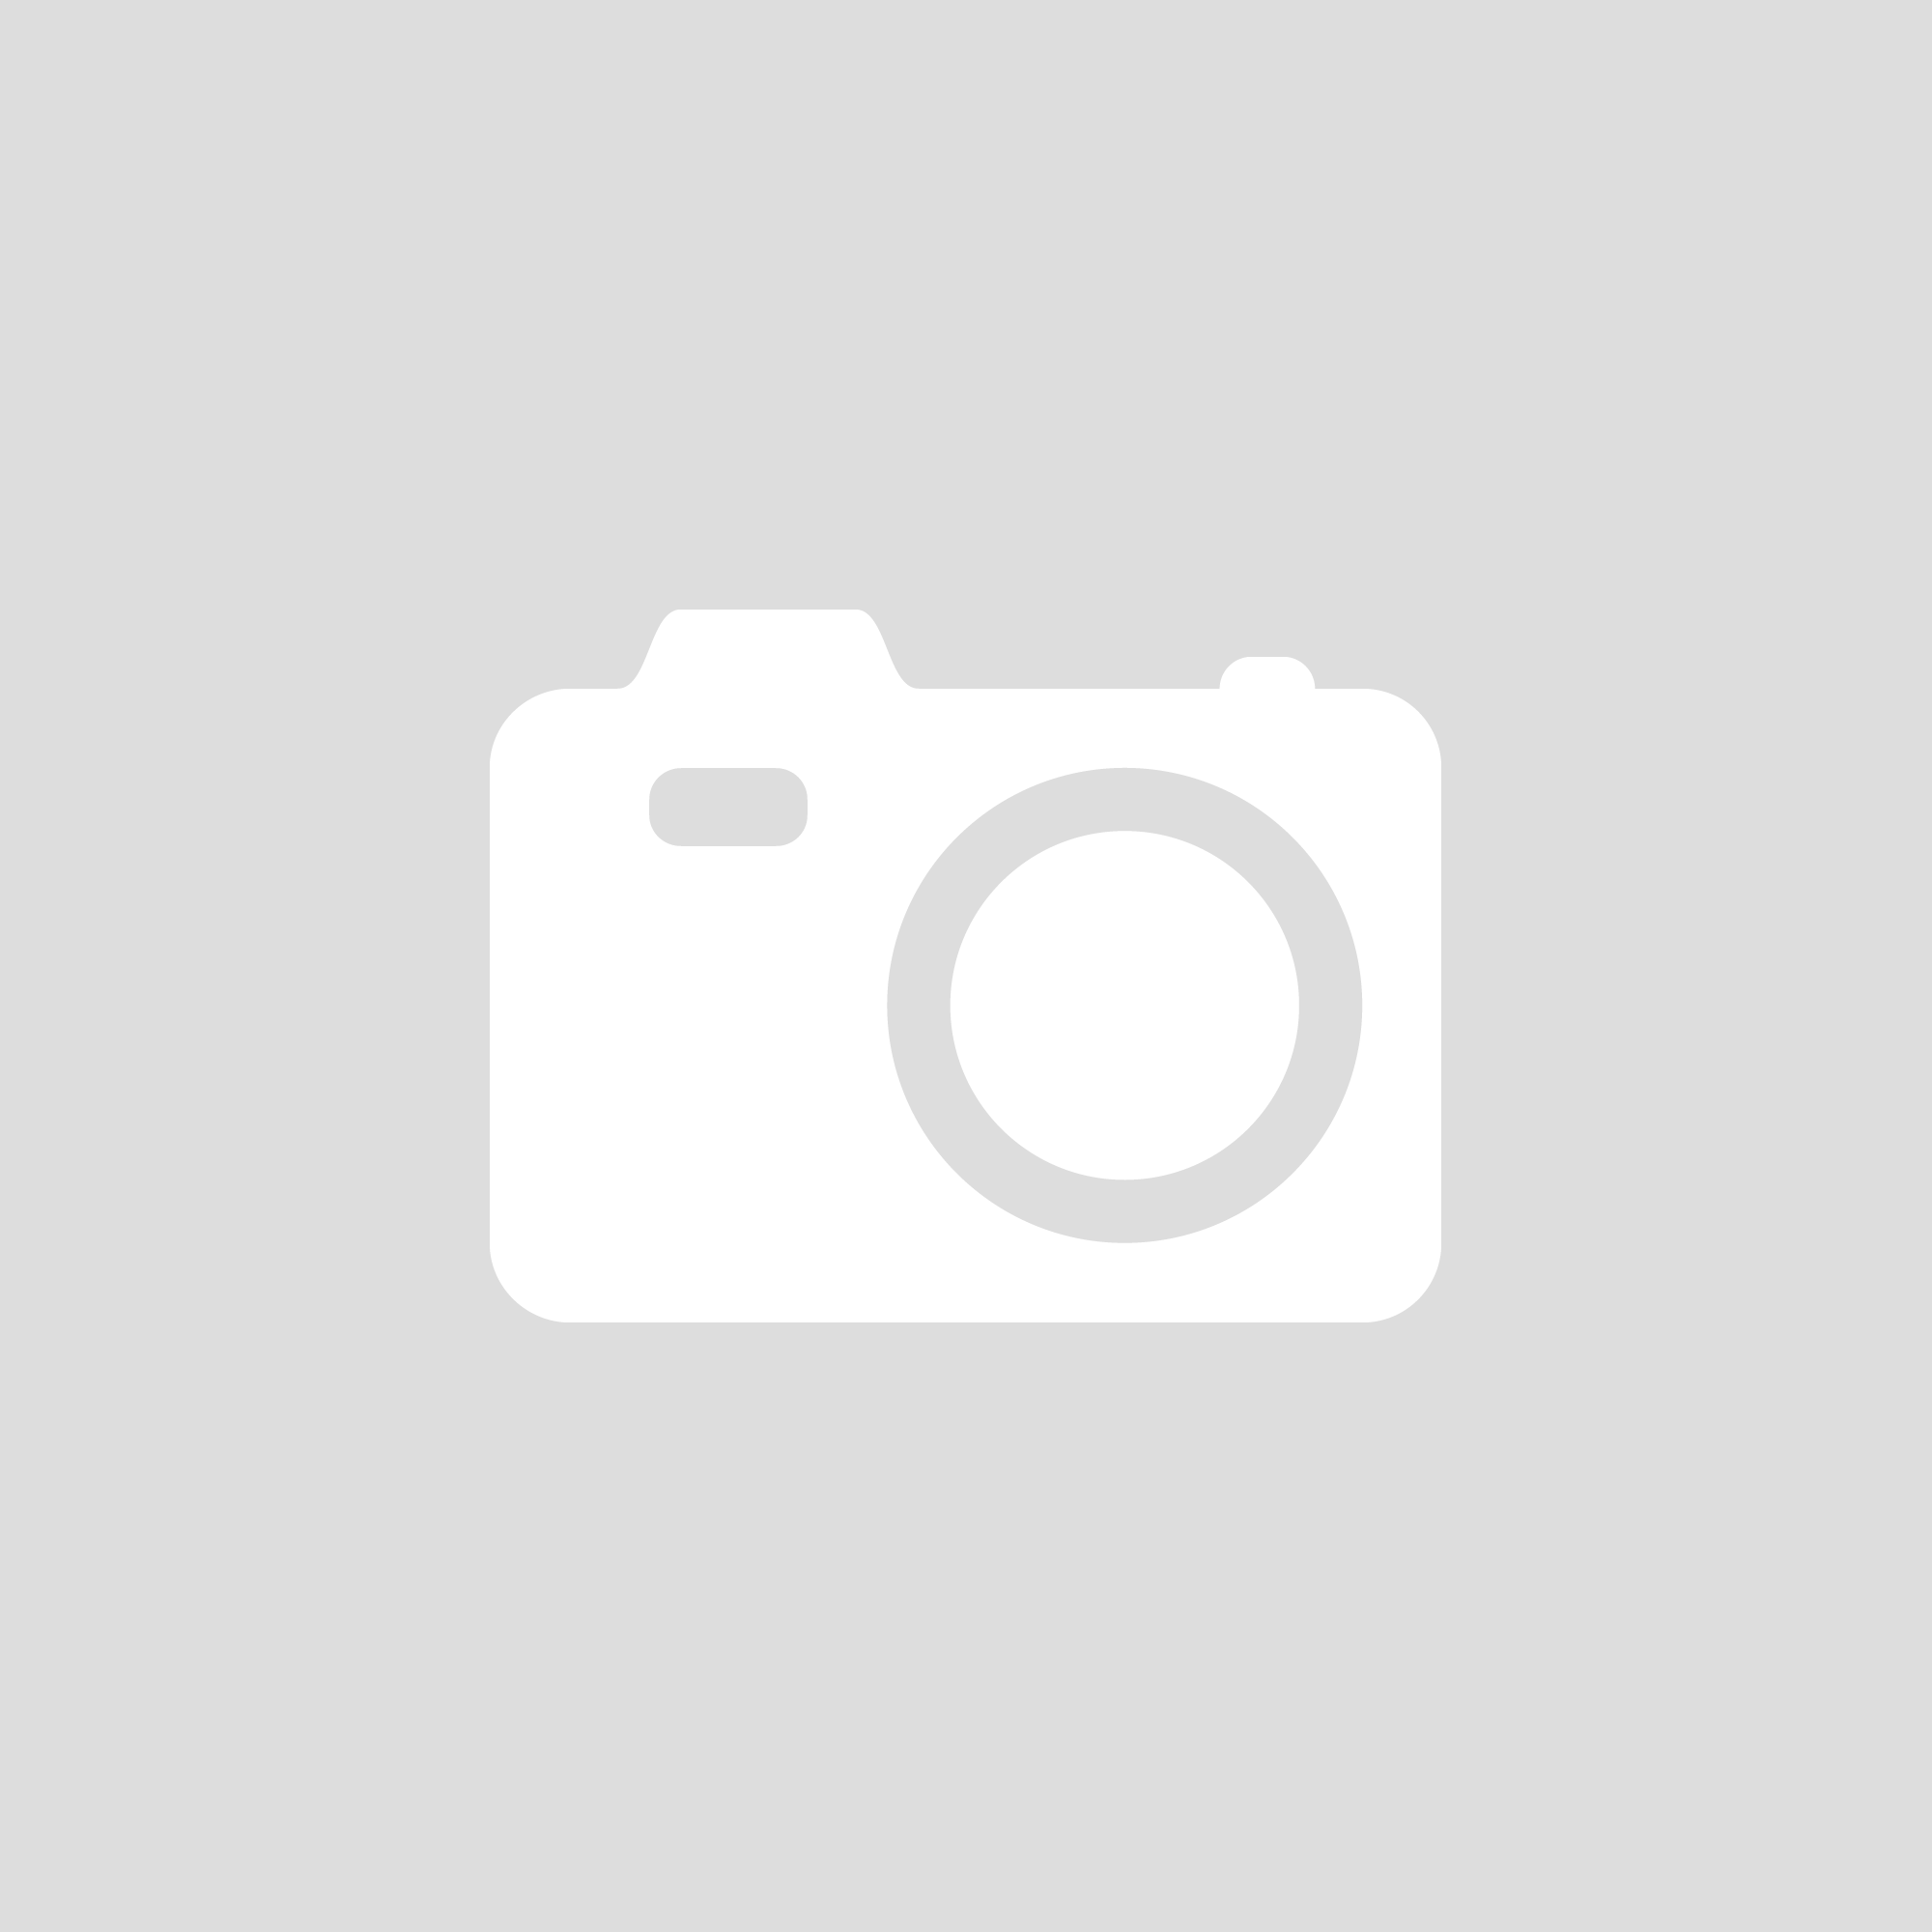 Shaggy Textured Cushion in Mint by CIMC